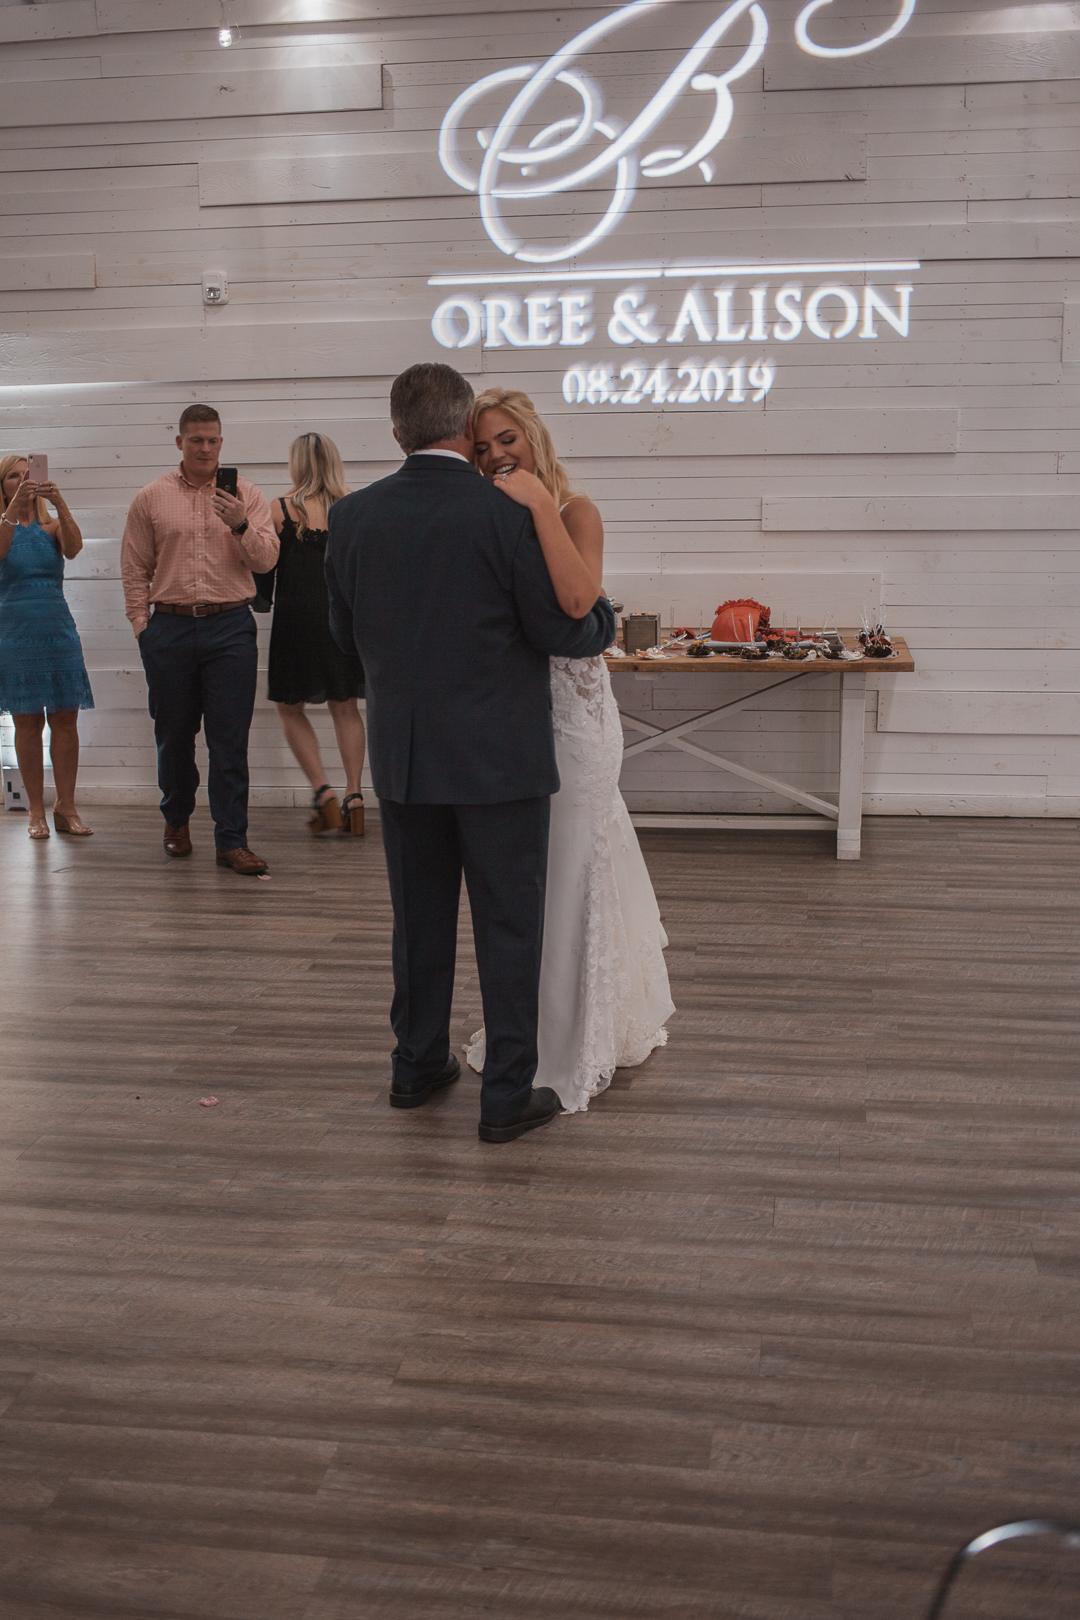 Aloson & Oree's Wedding (8-24-19) Edited5924.jpg